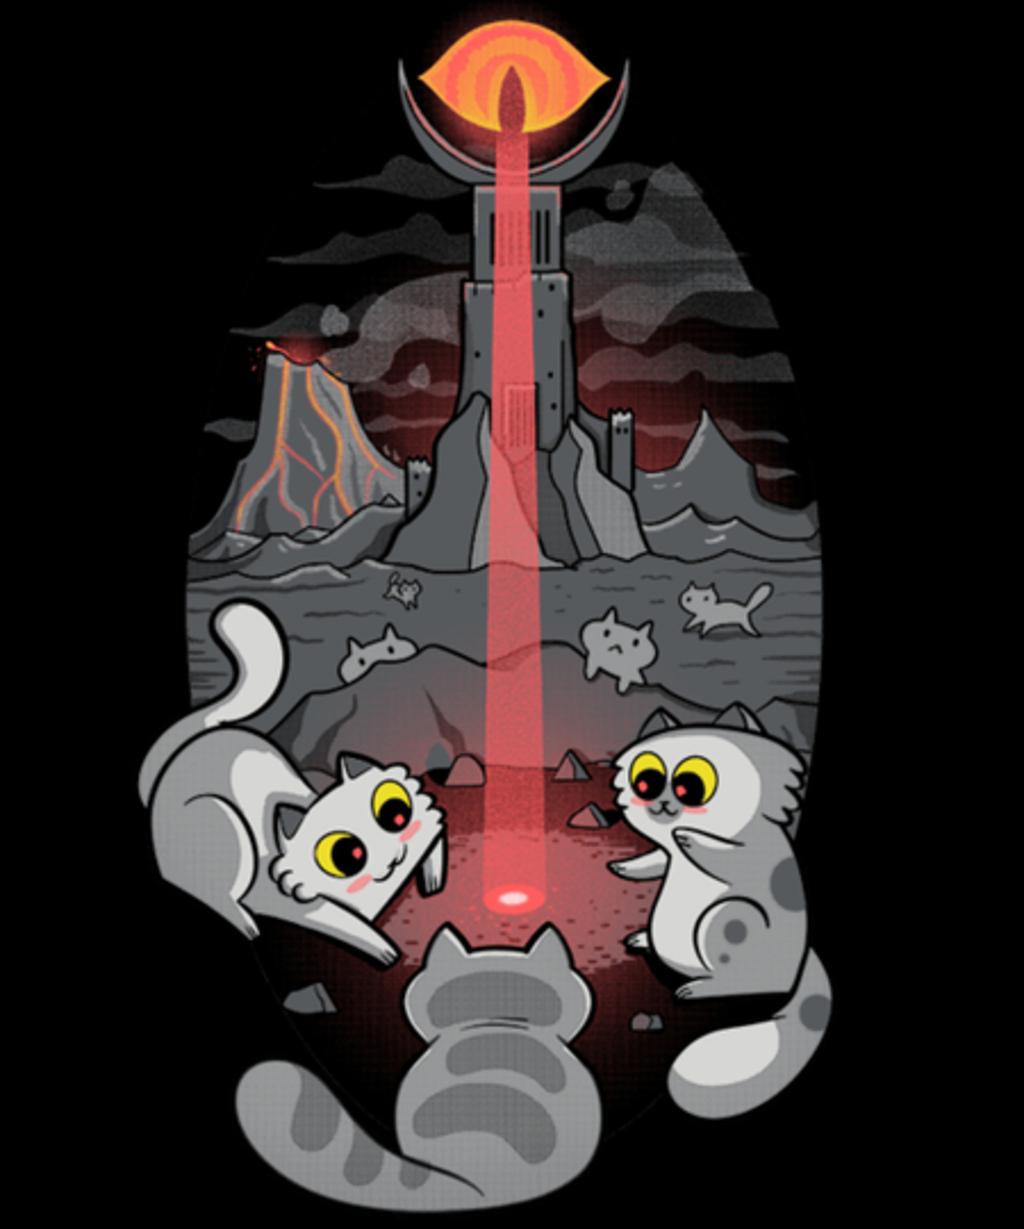 Qwertee: The Eye of Meowdor